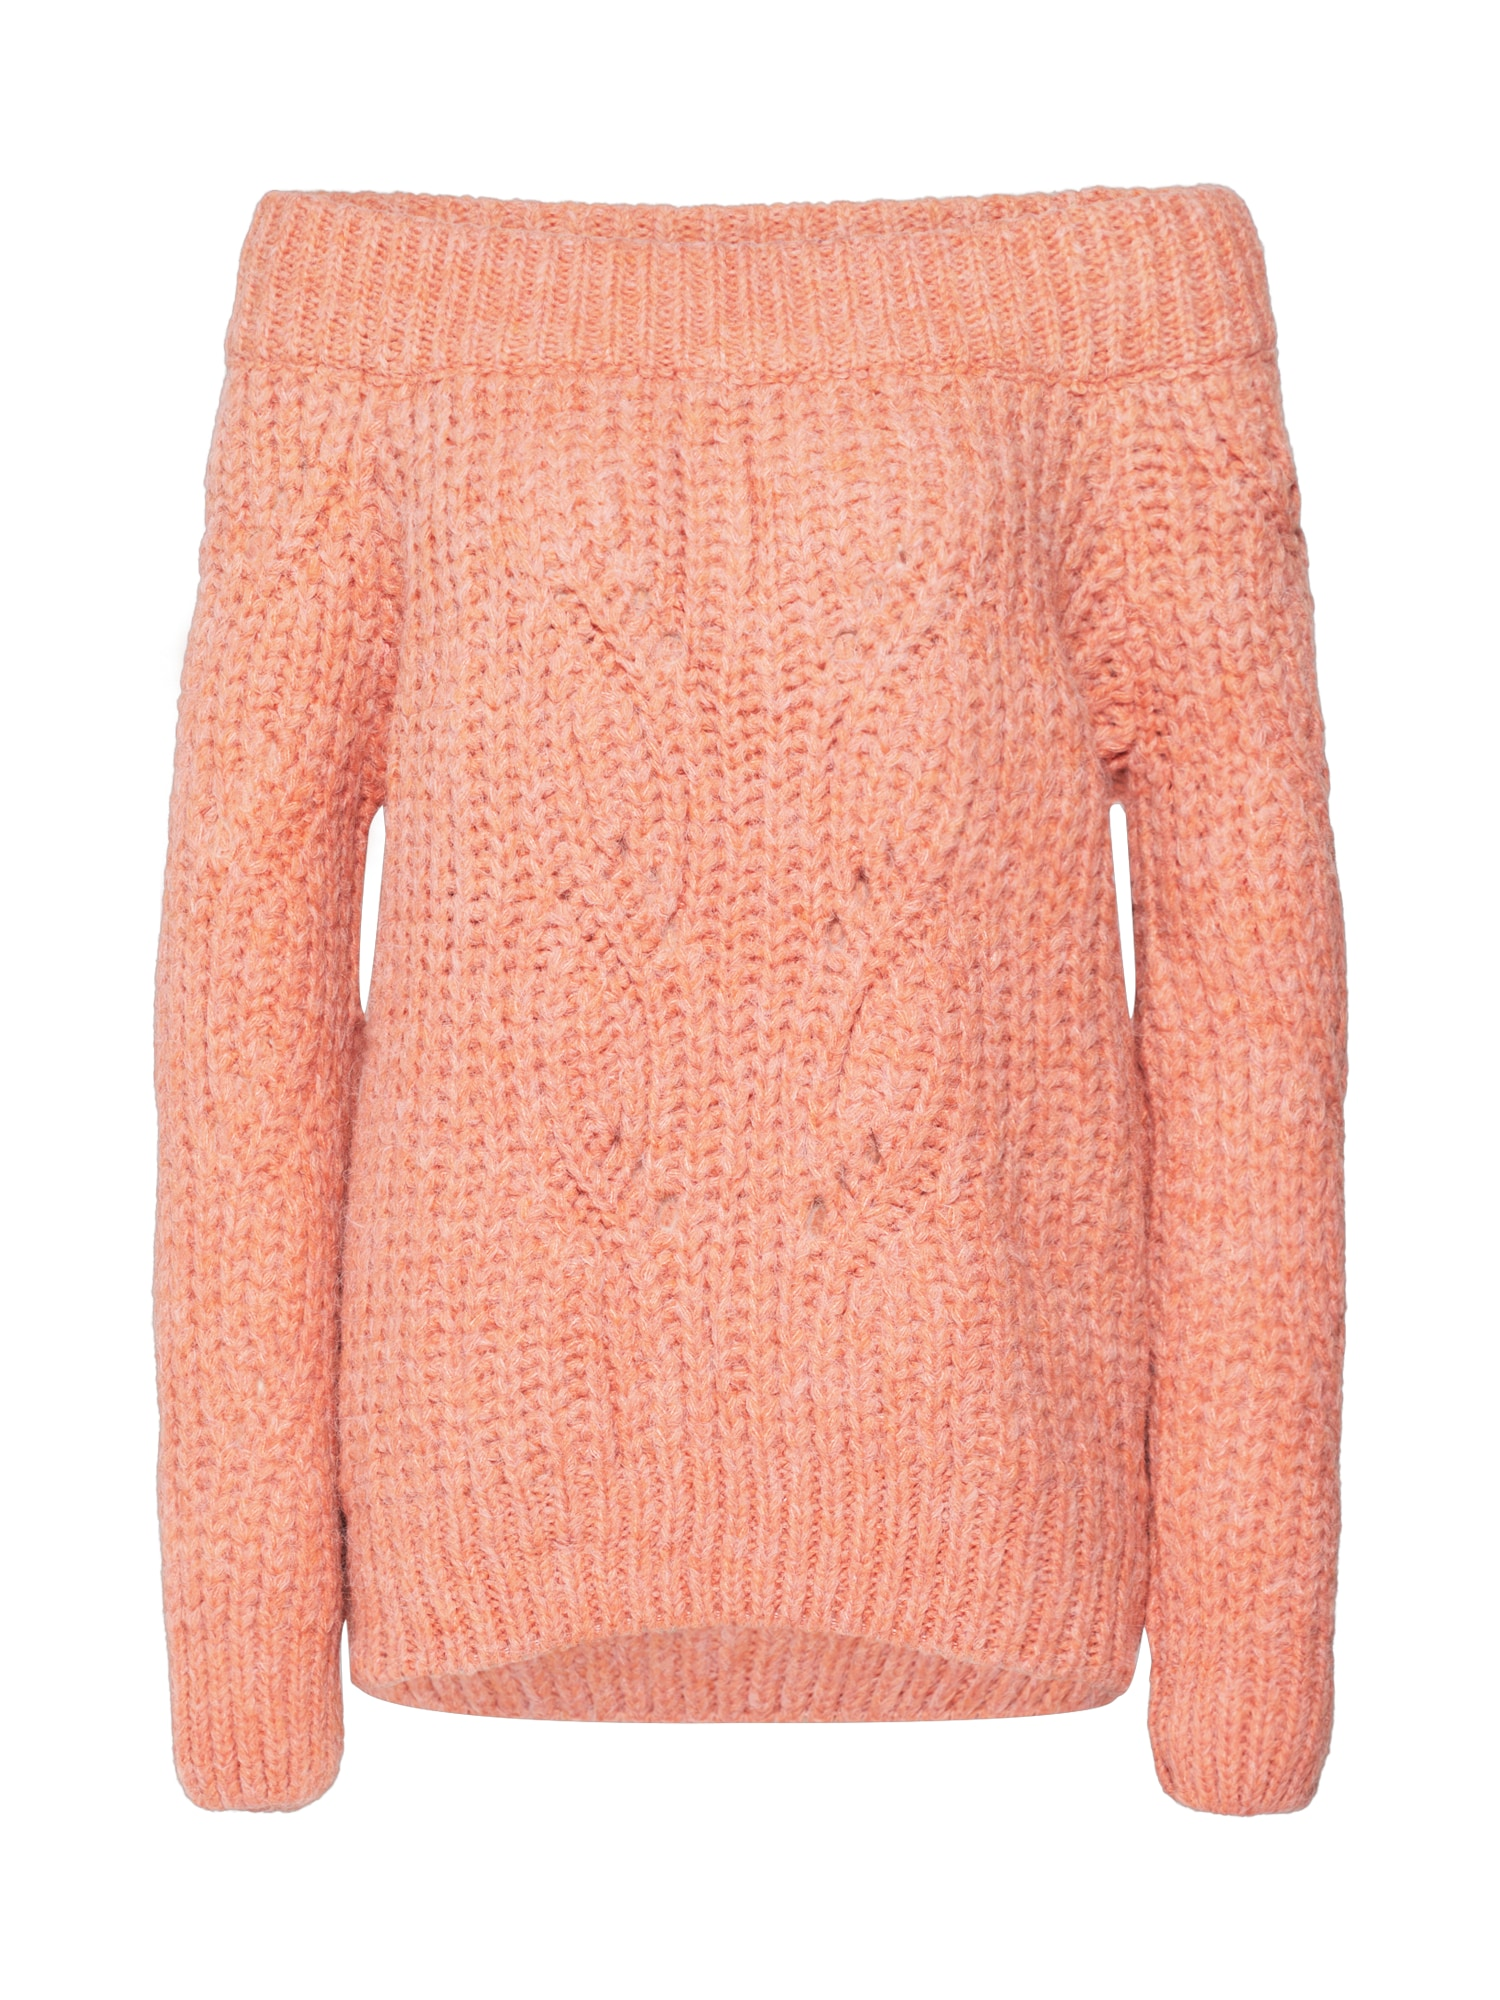 ABOUT YOU Megztinis 'Hetty' persikų spalva